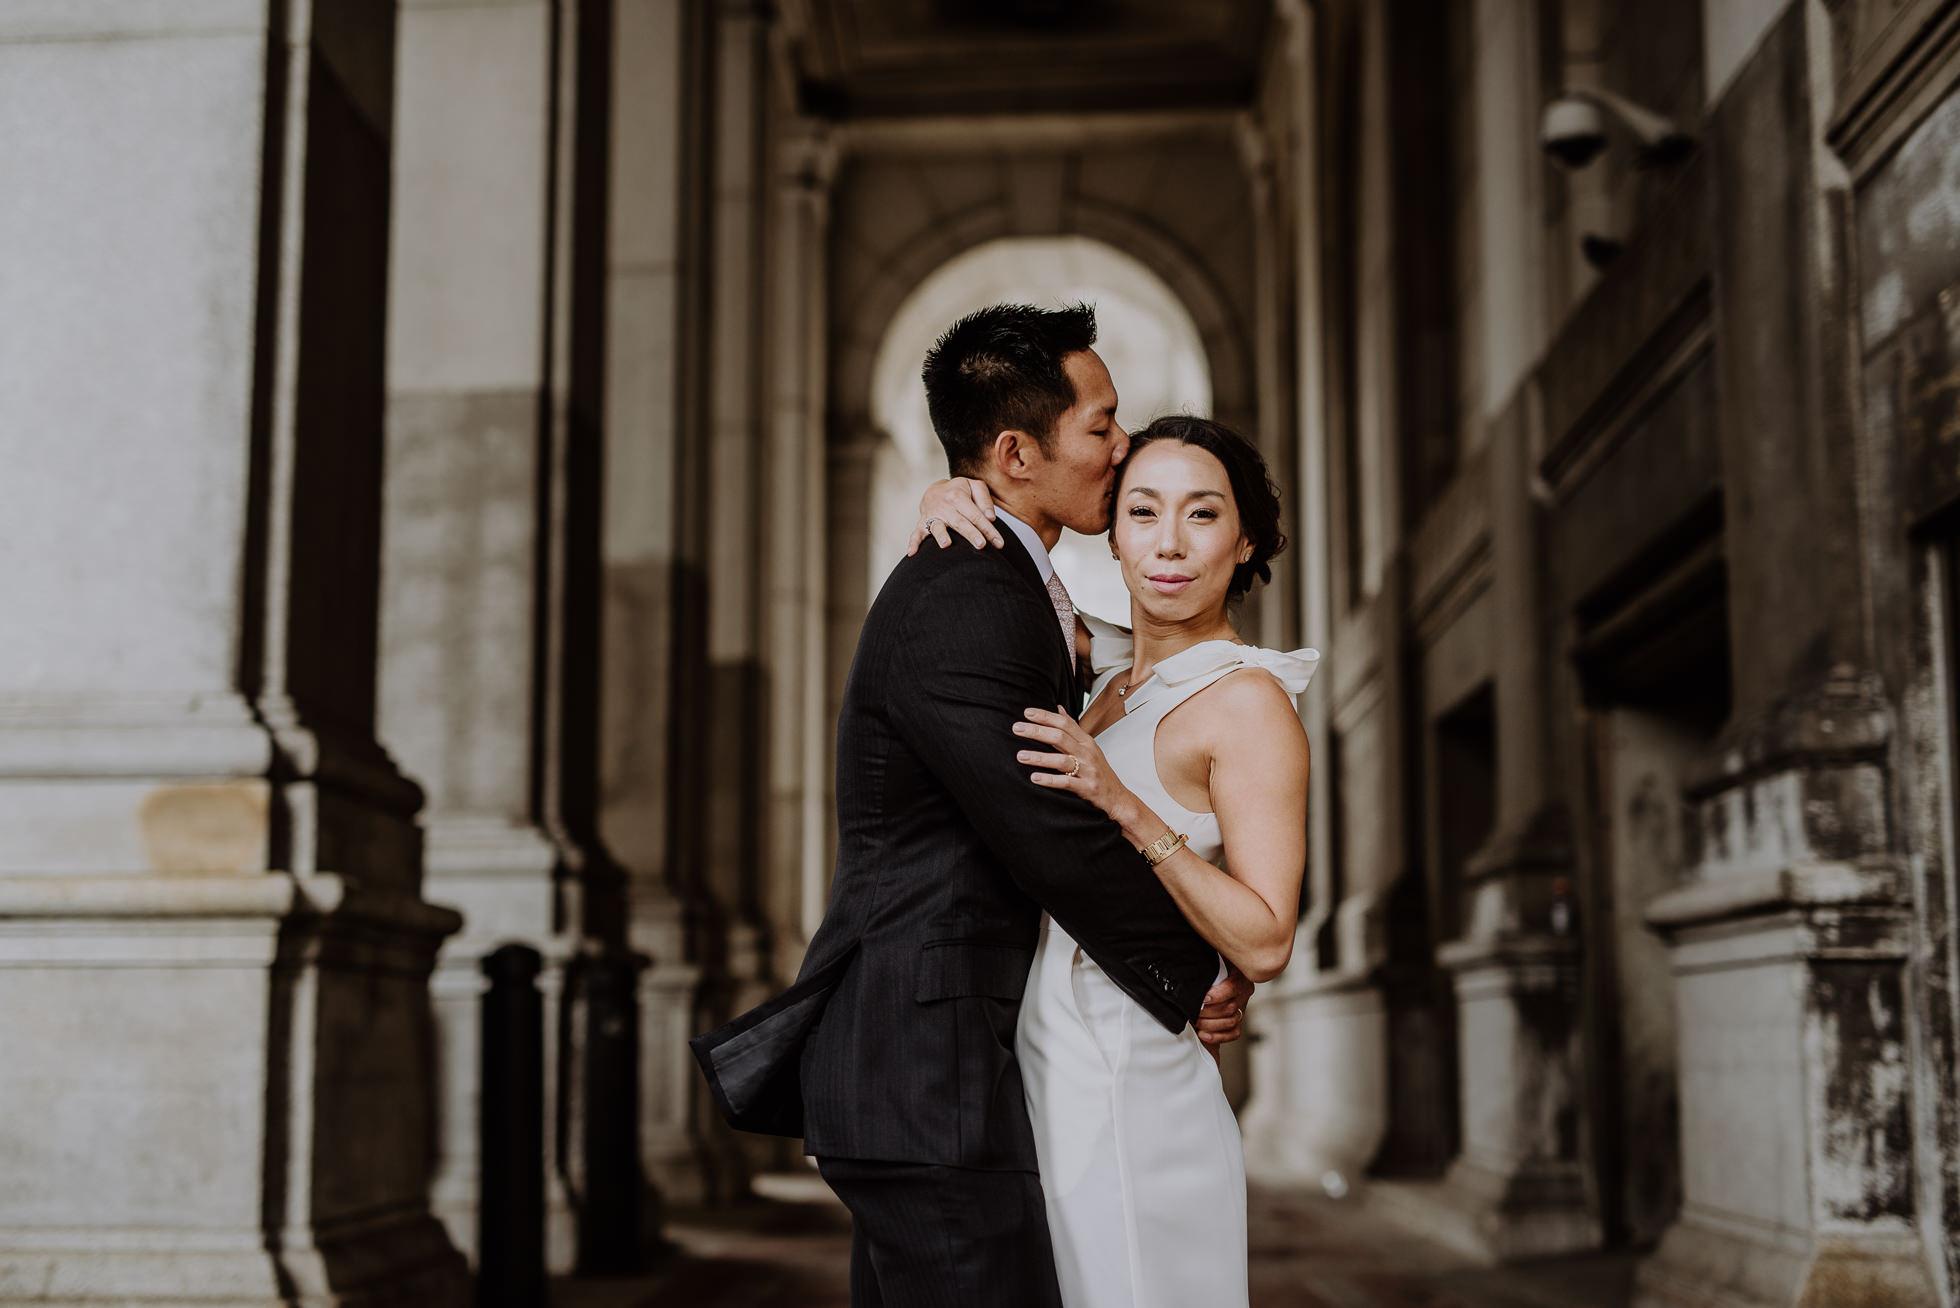 NYC city hall wedding photographers